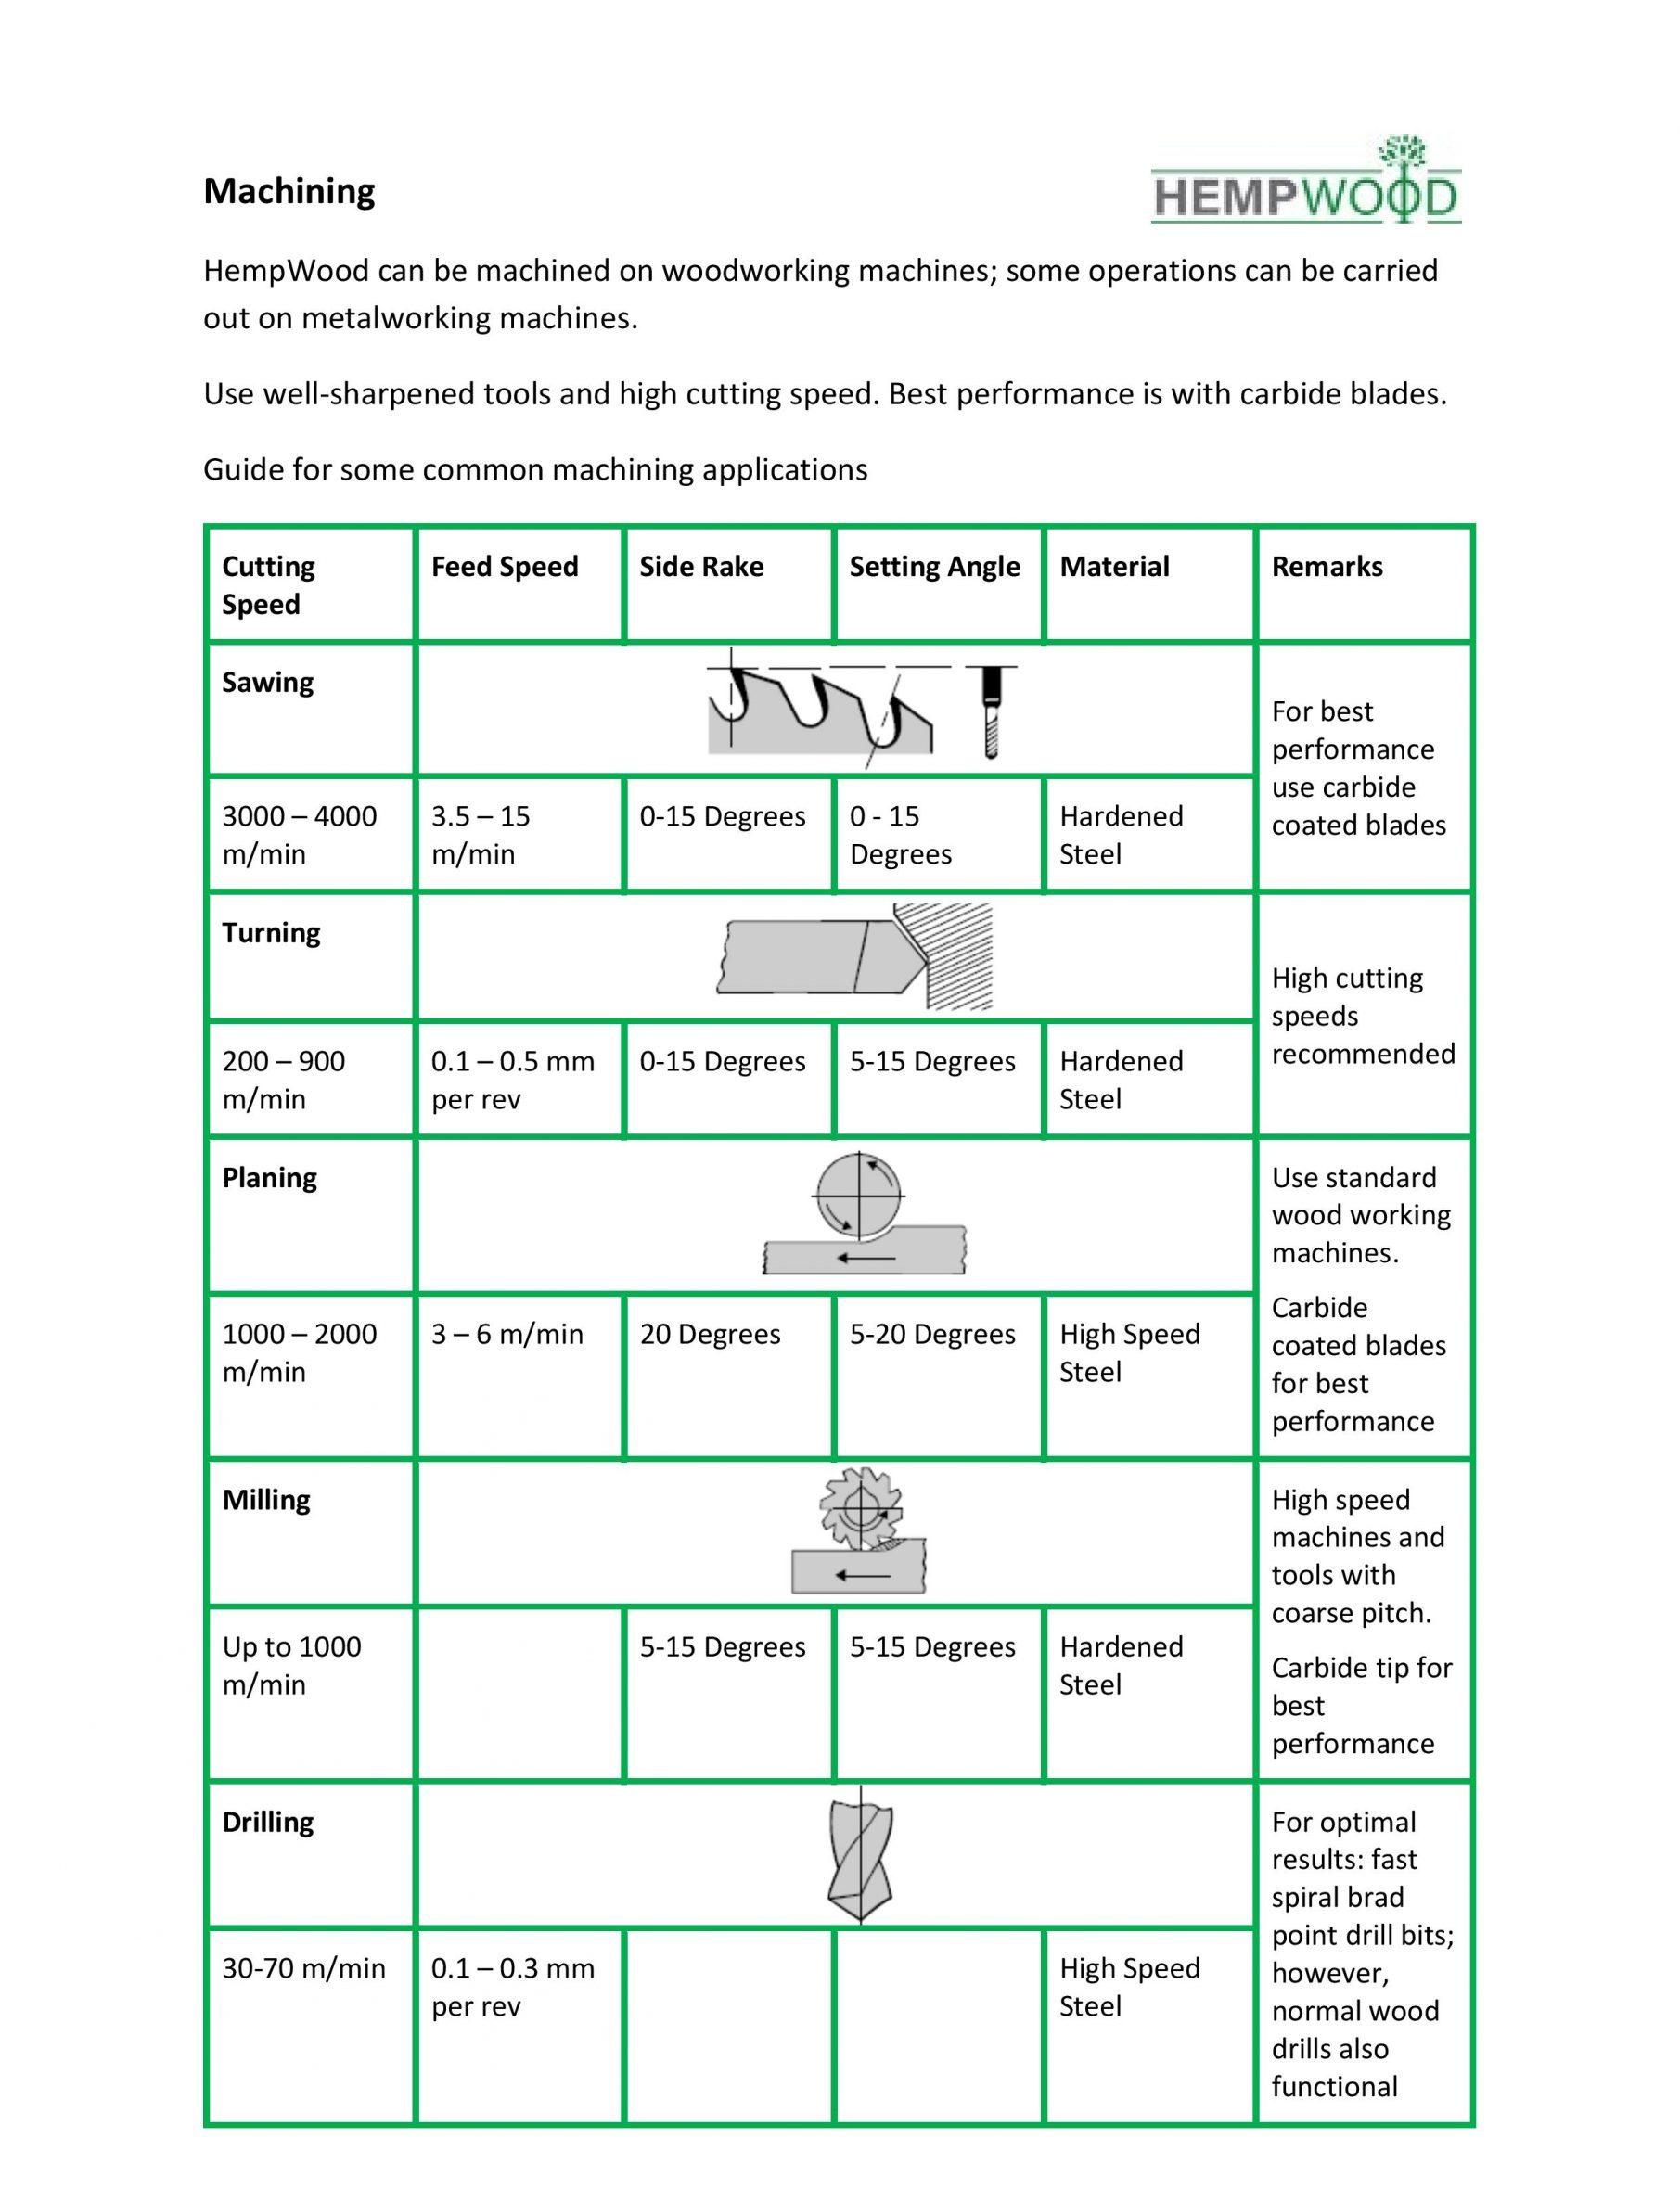 HempWood Machining Guide